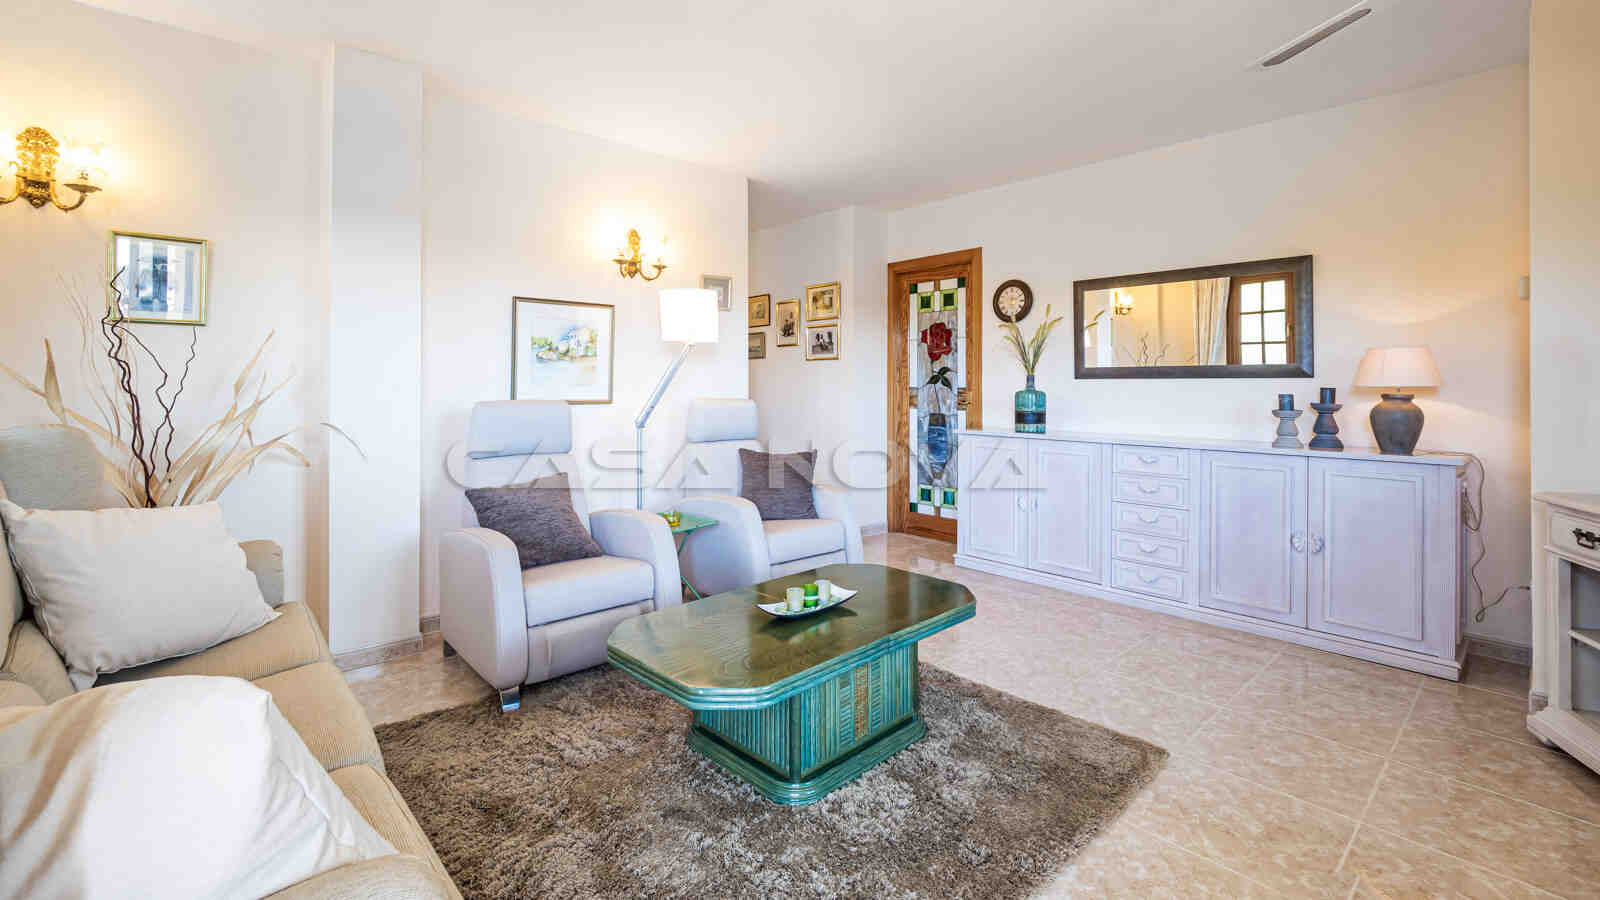 Charmantes Wohnzimmer dieses Mallorca Penthauses